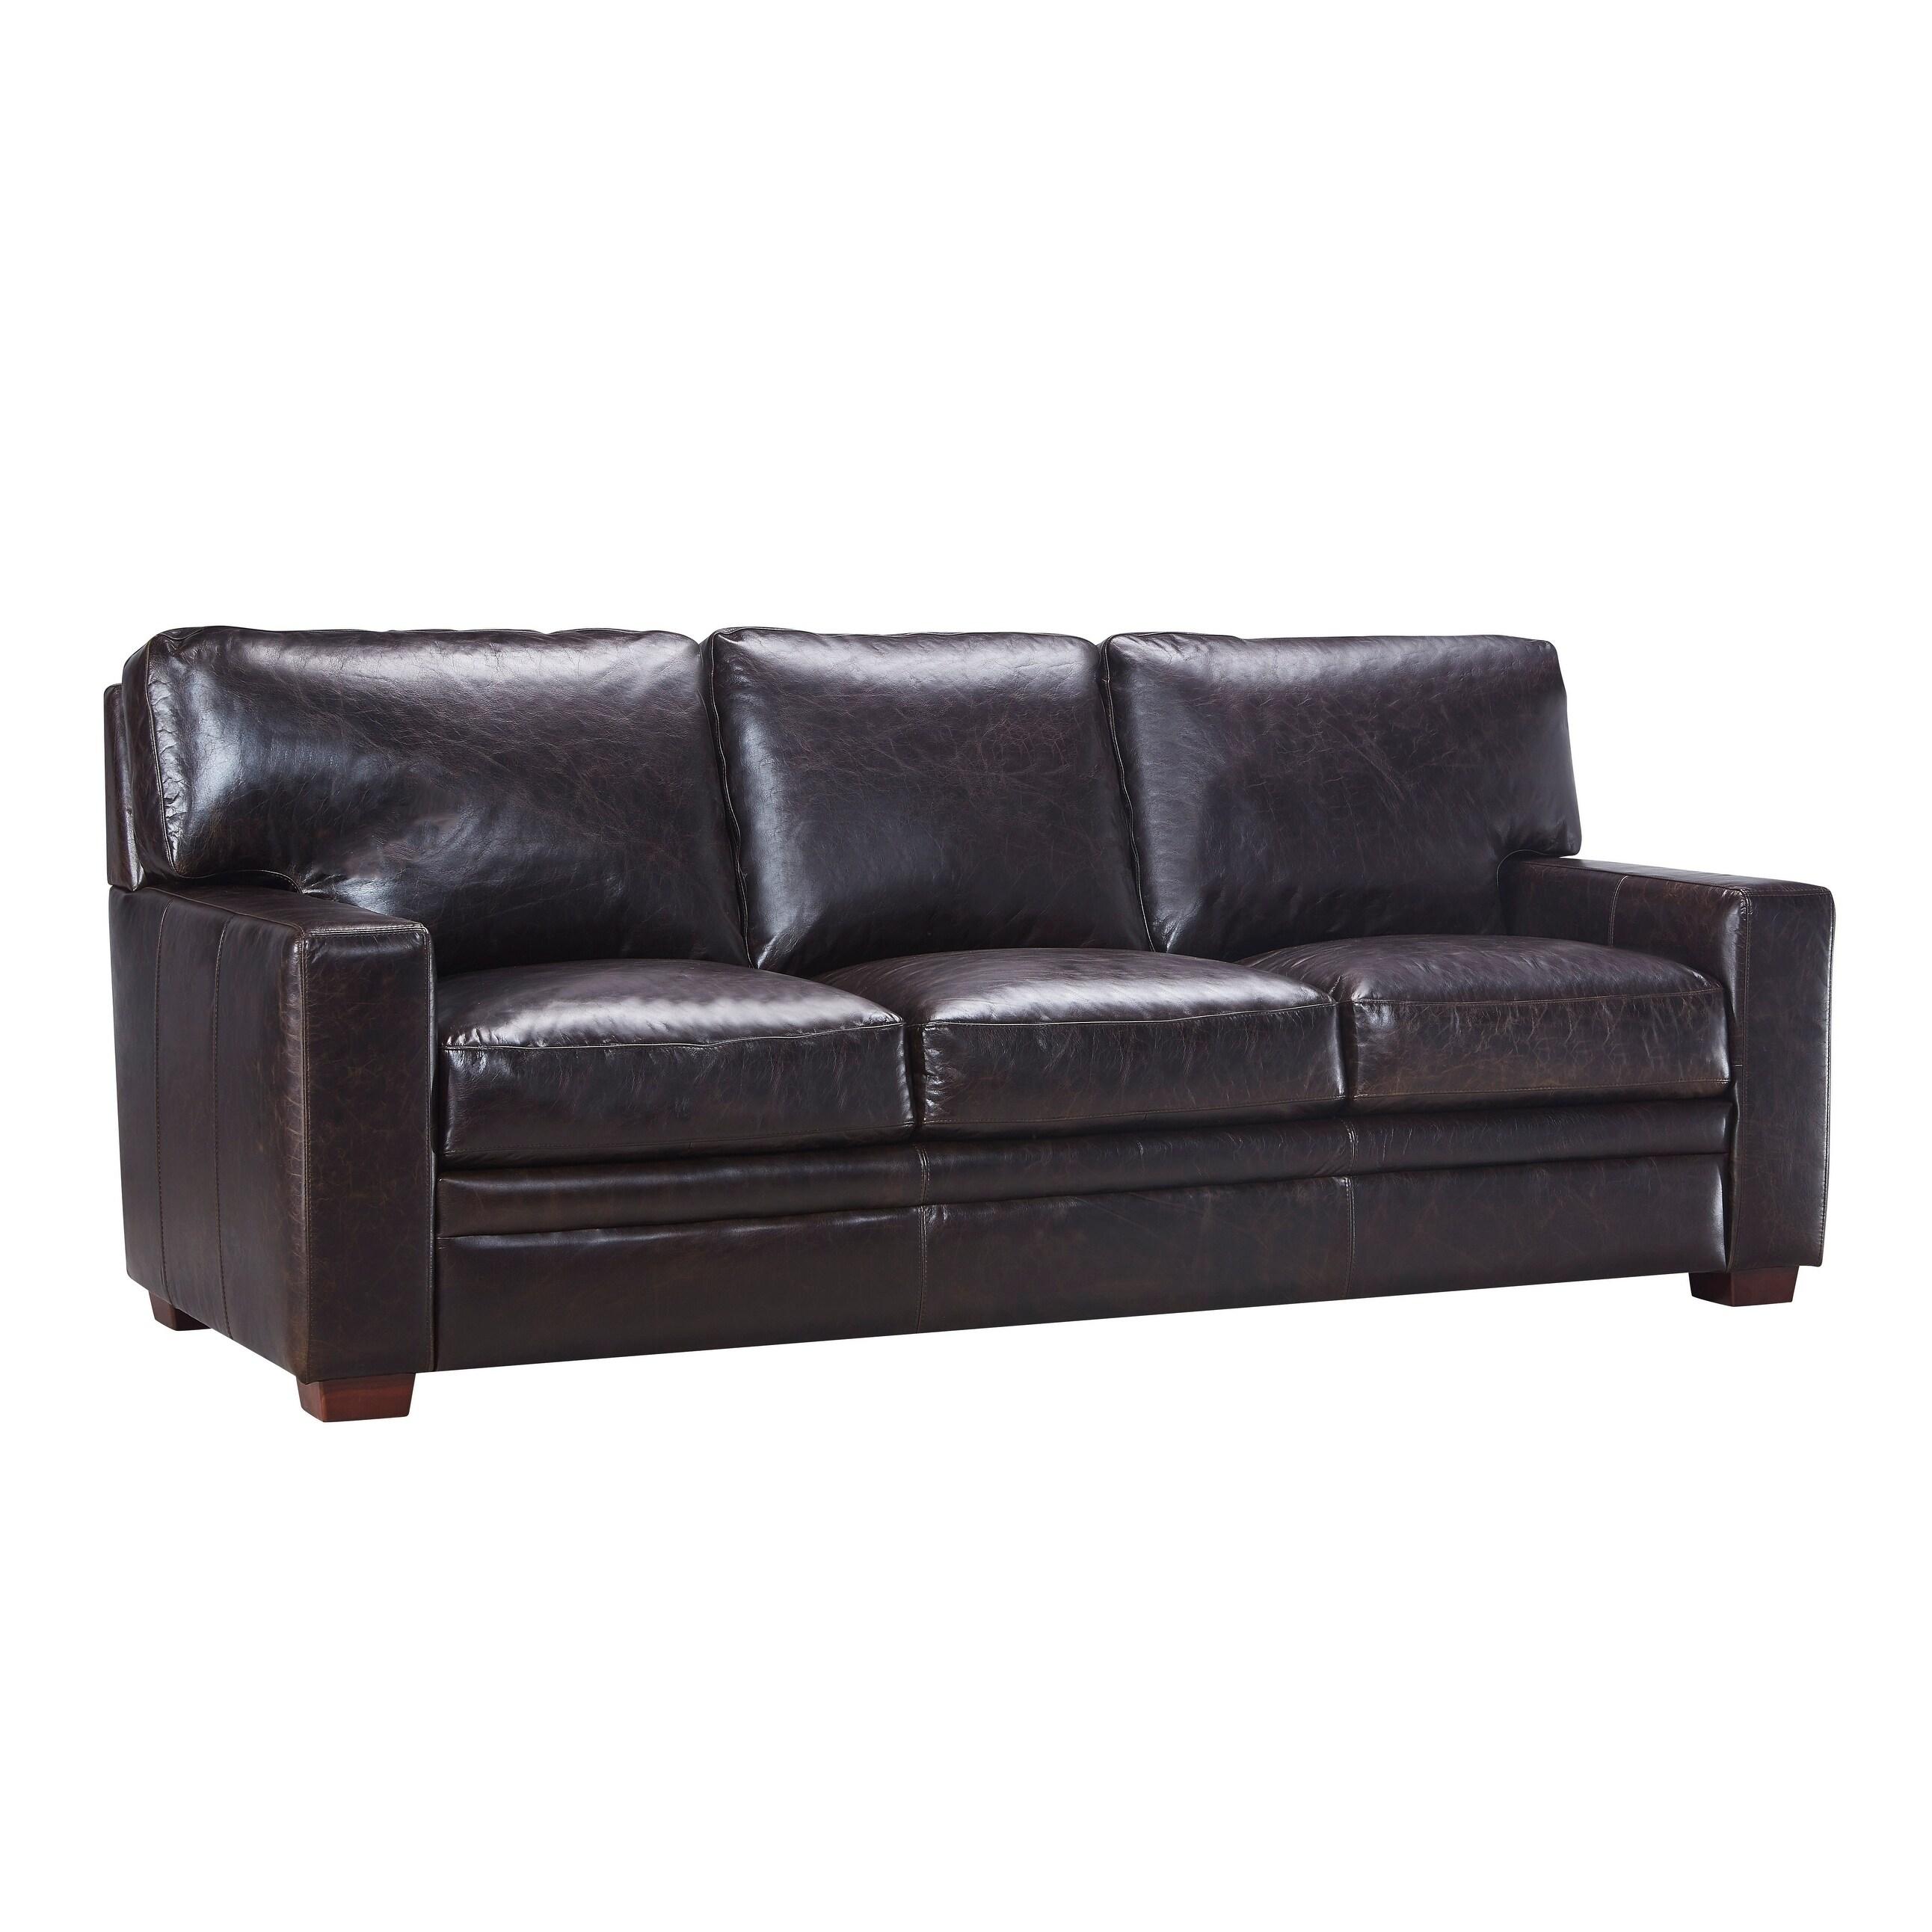 Top Grain Italian Leather Sofa